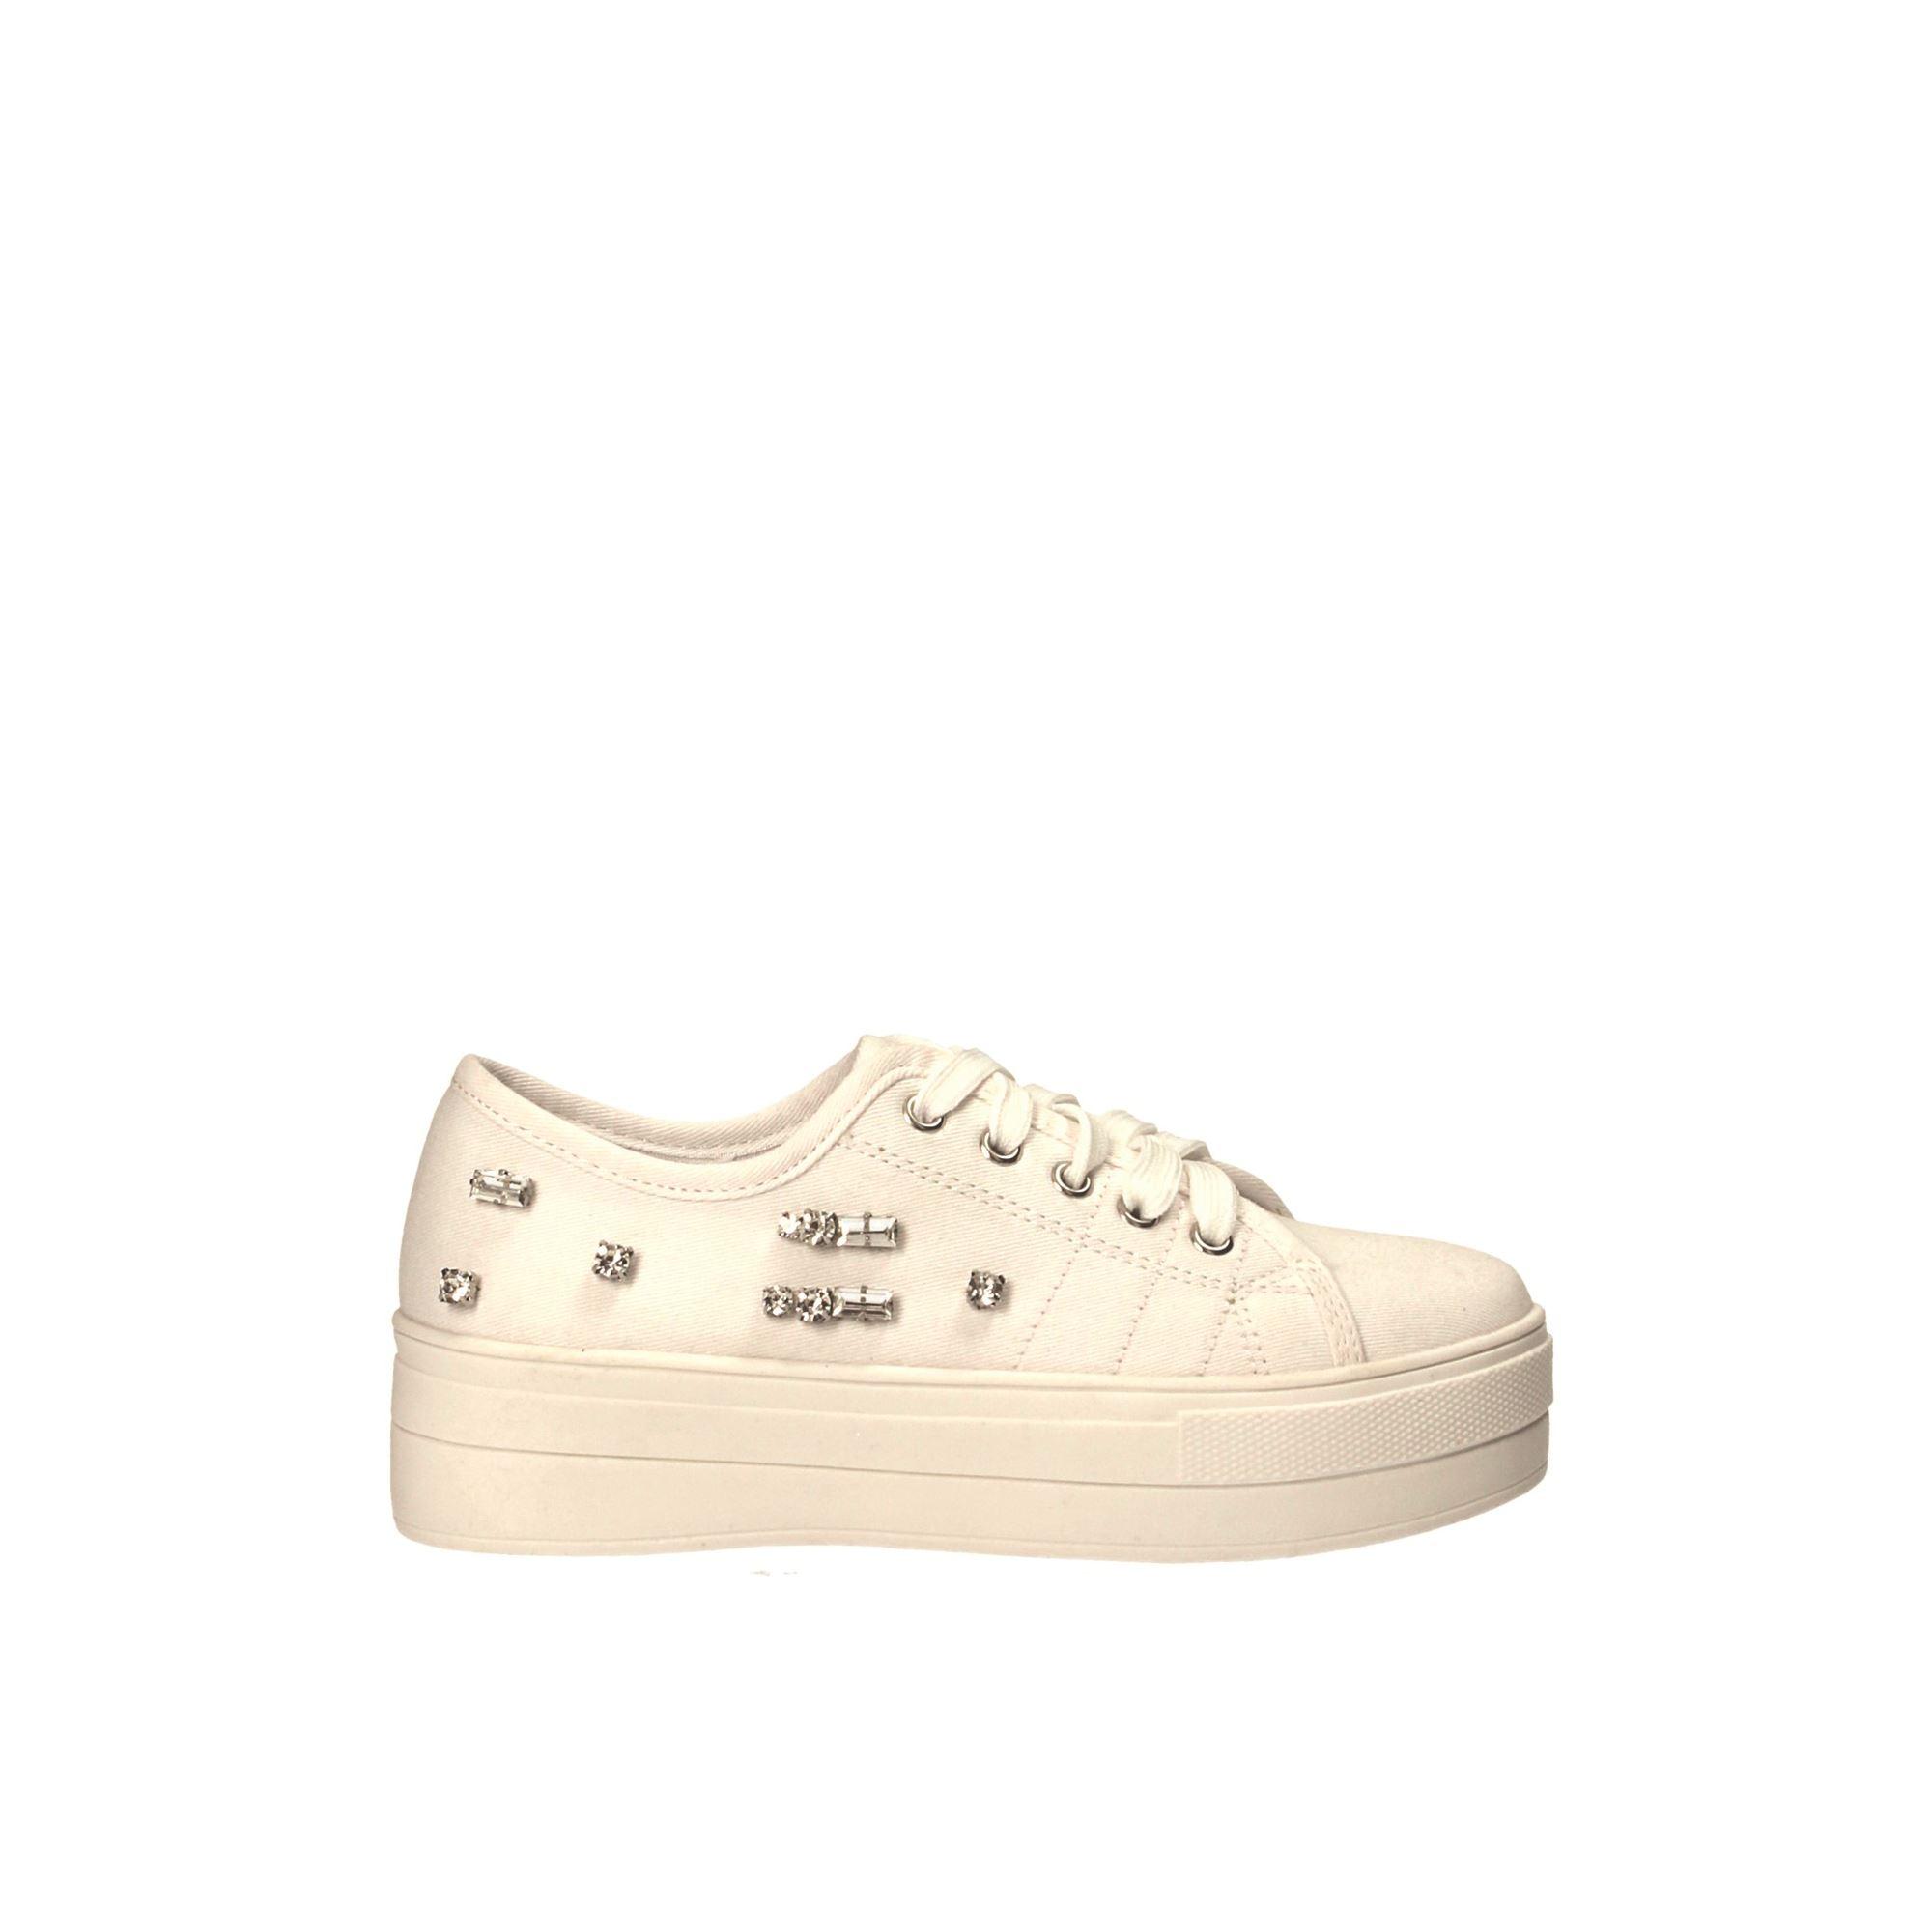 Scarpe On Line Italia Tata 3Sneakers Shop Junior 10 TlJc1uF3K